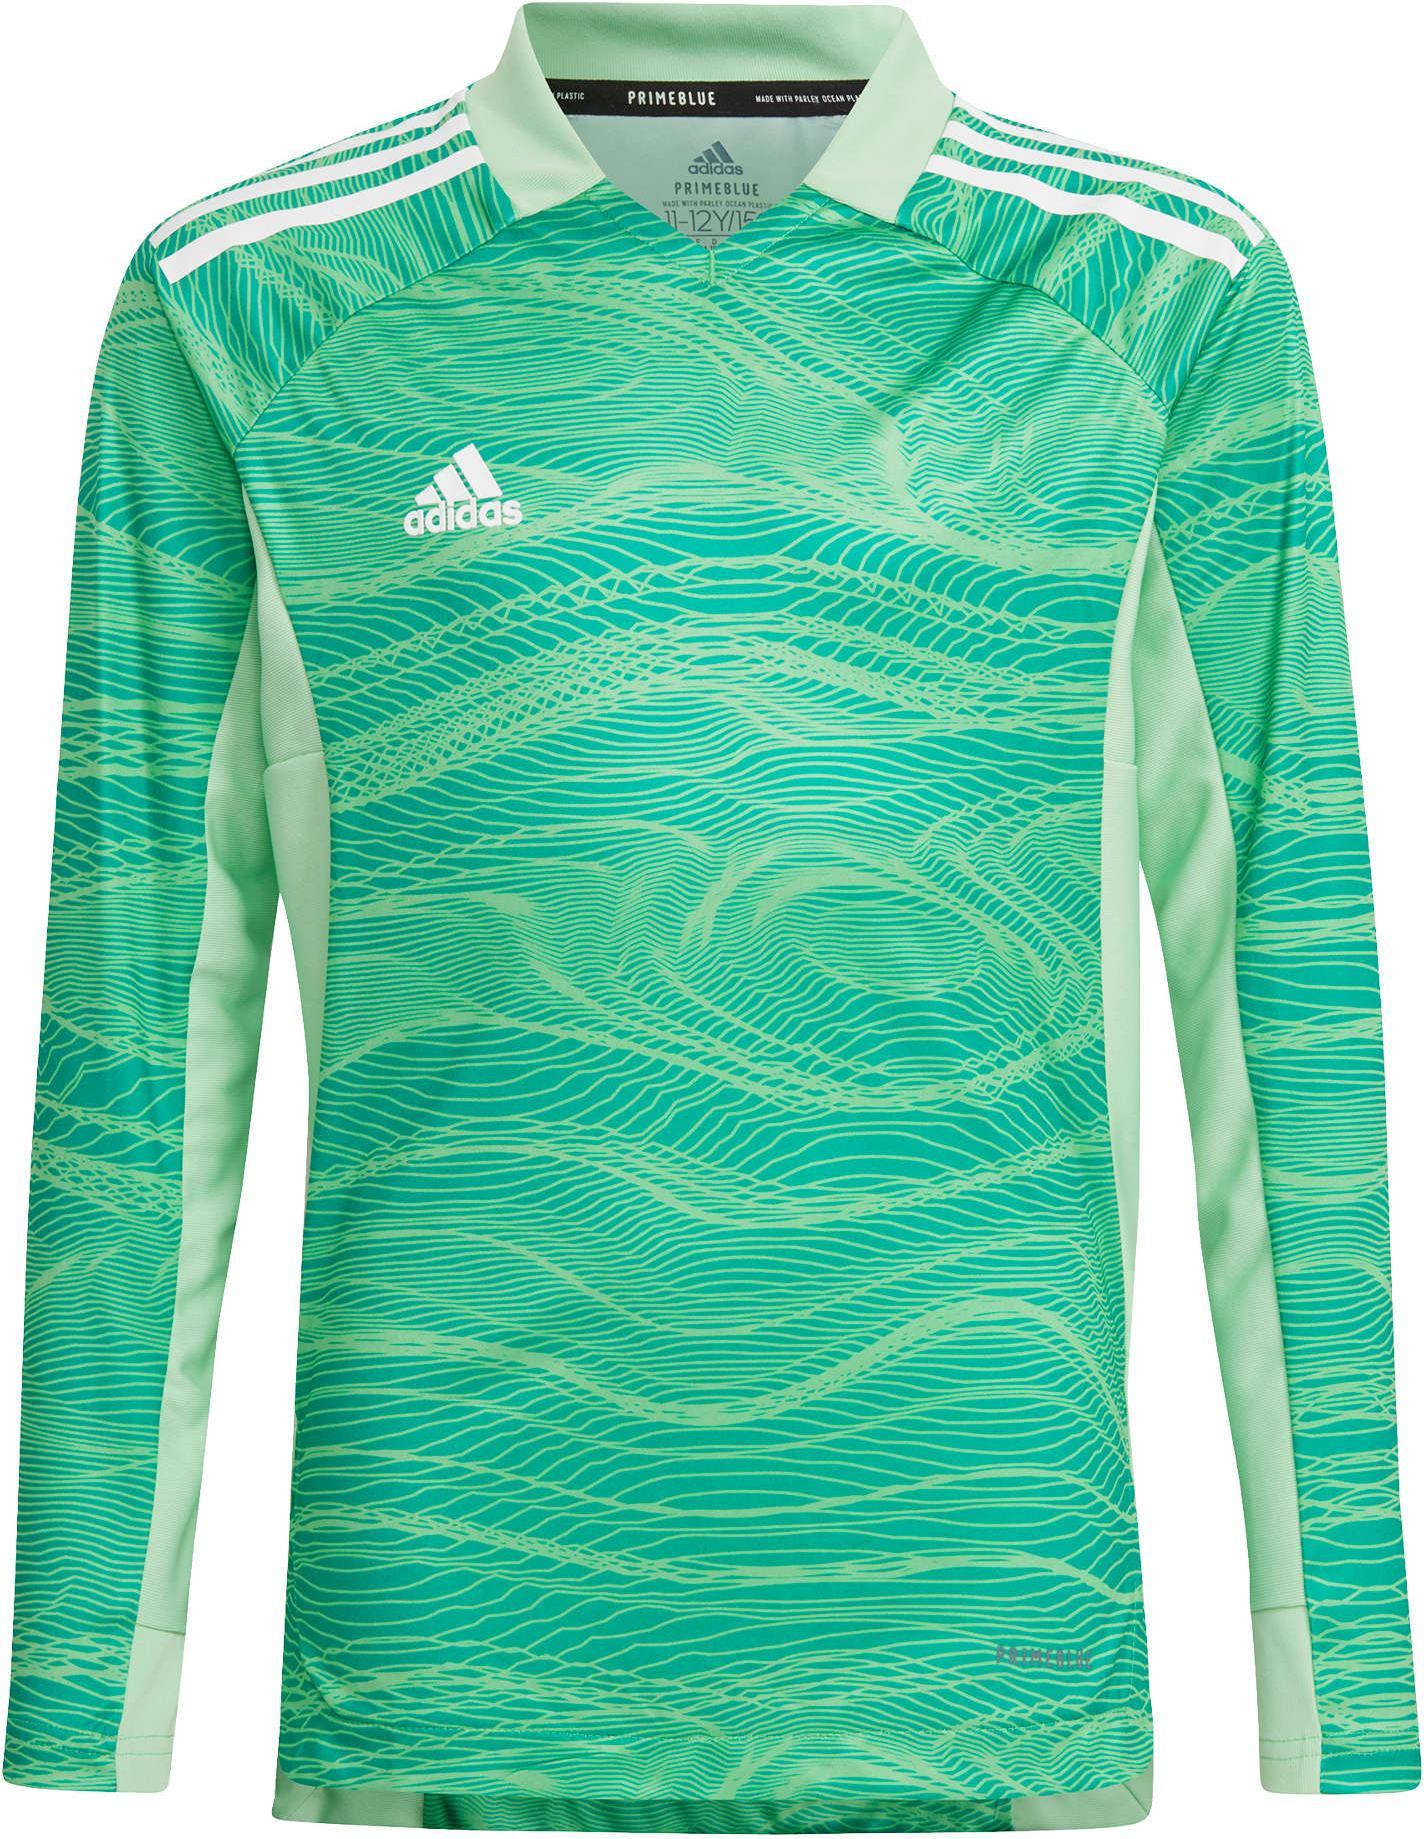 Long-sleeve shirt adidas CON GK 21 JSYYL - Top4Football.com